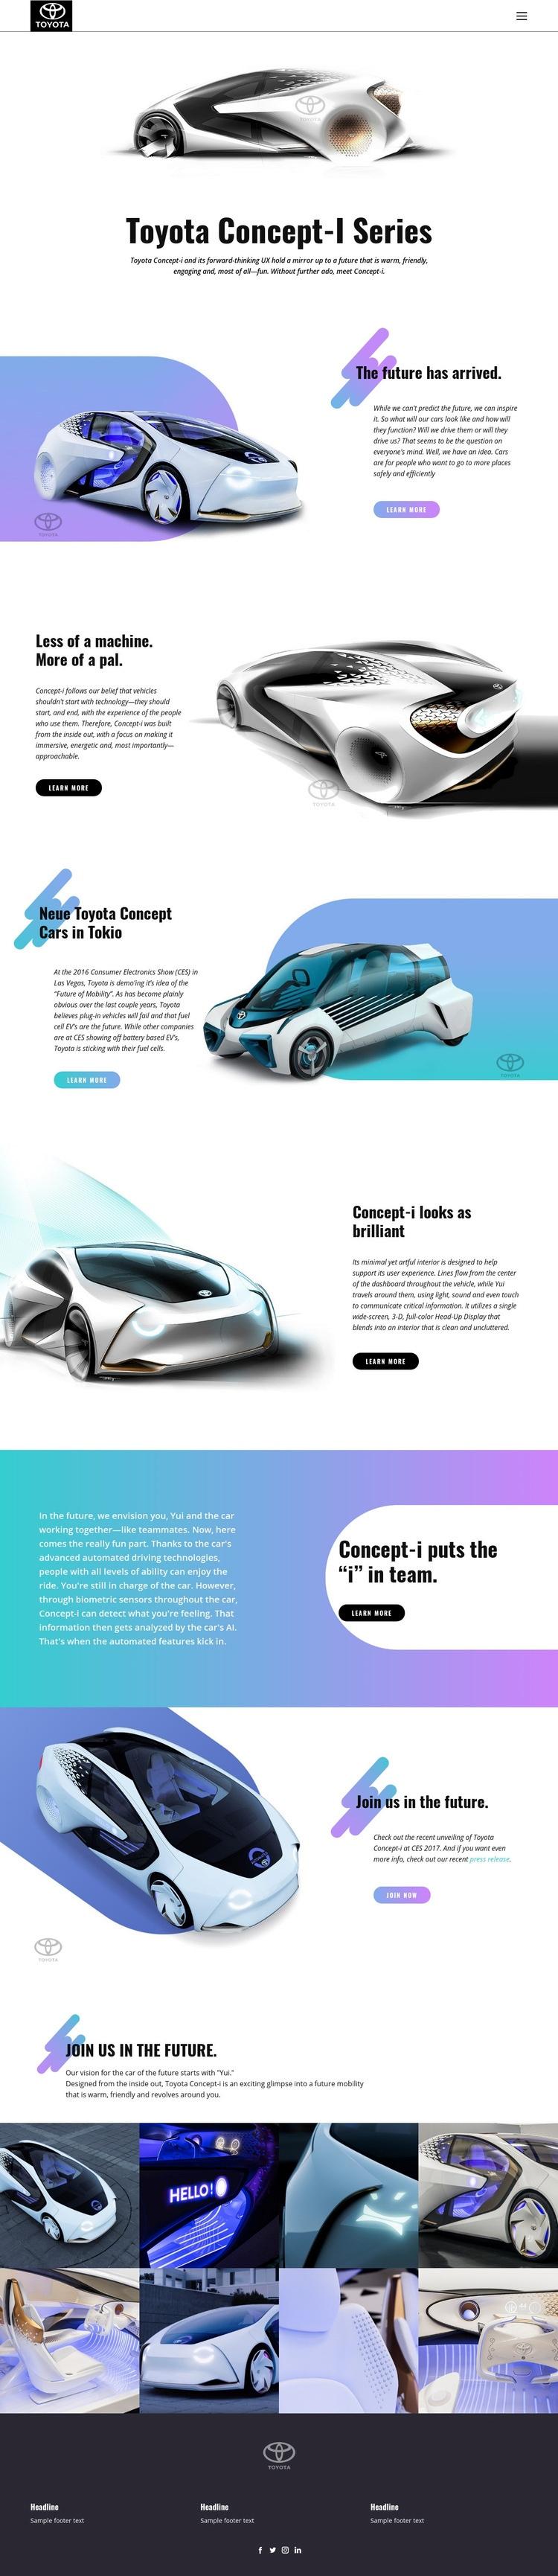 Advanced innovation cars Html Code Example